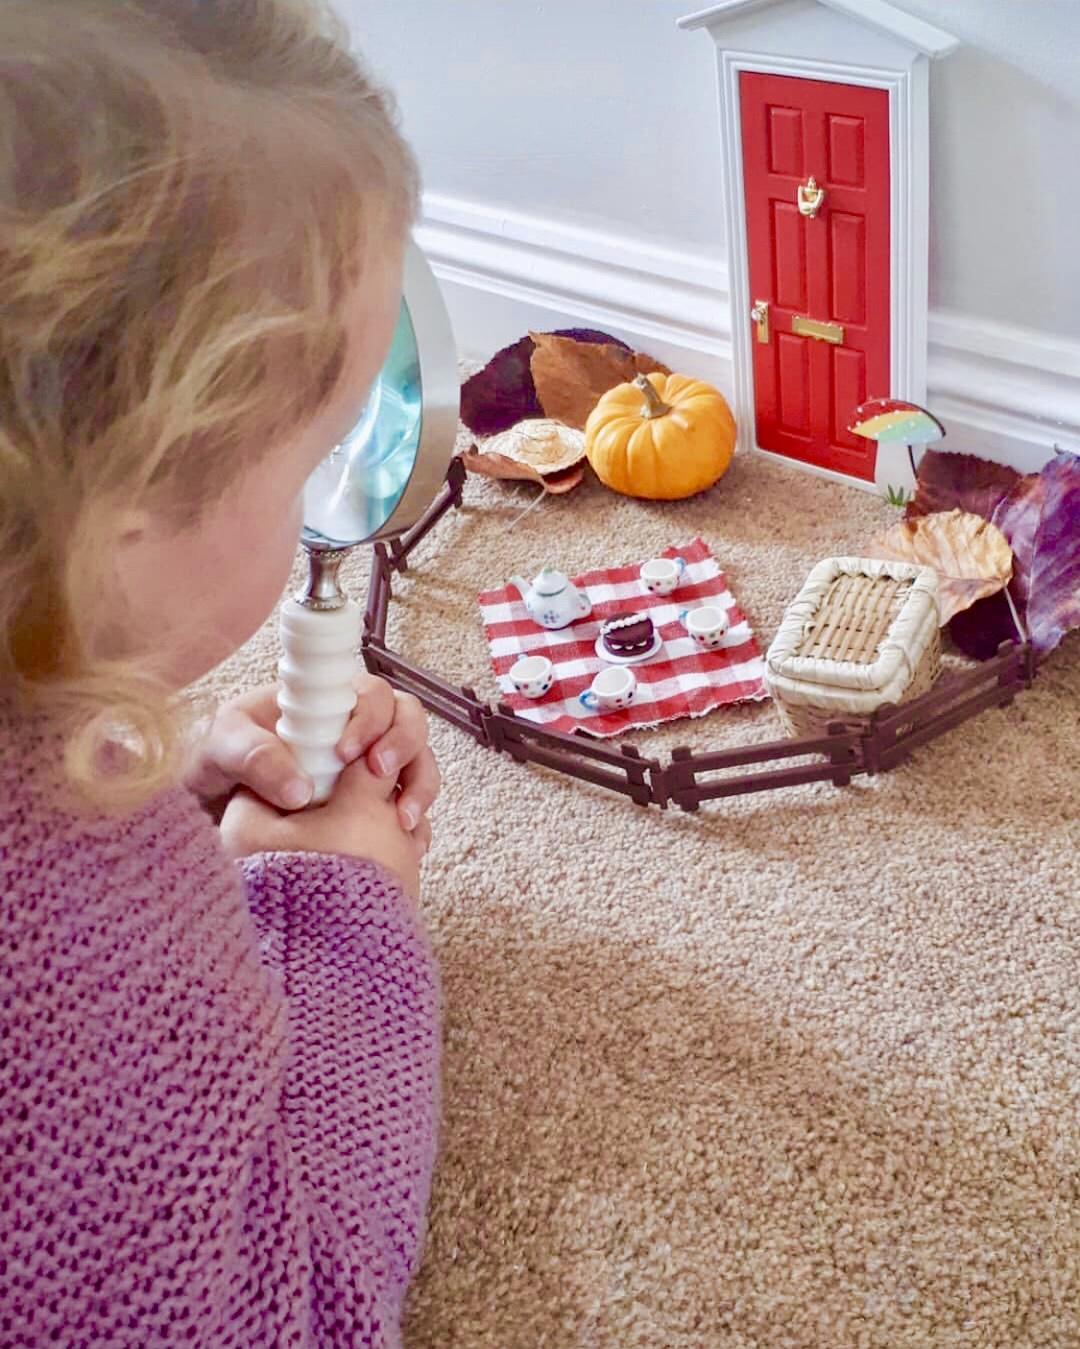 Eva investigates her new fairy door